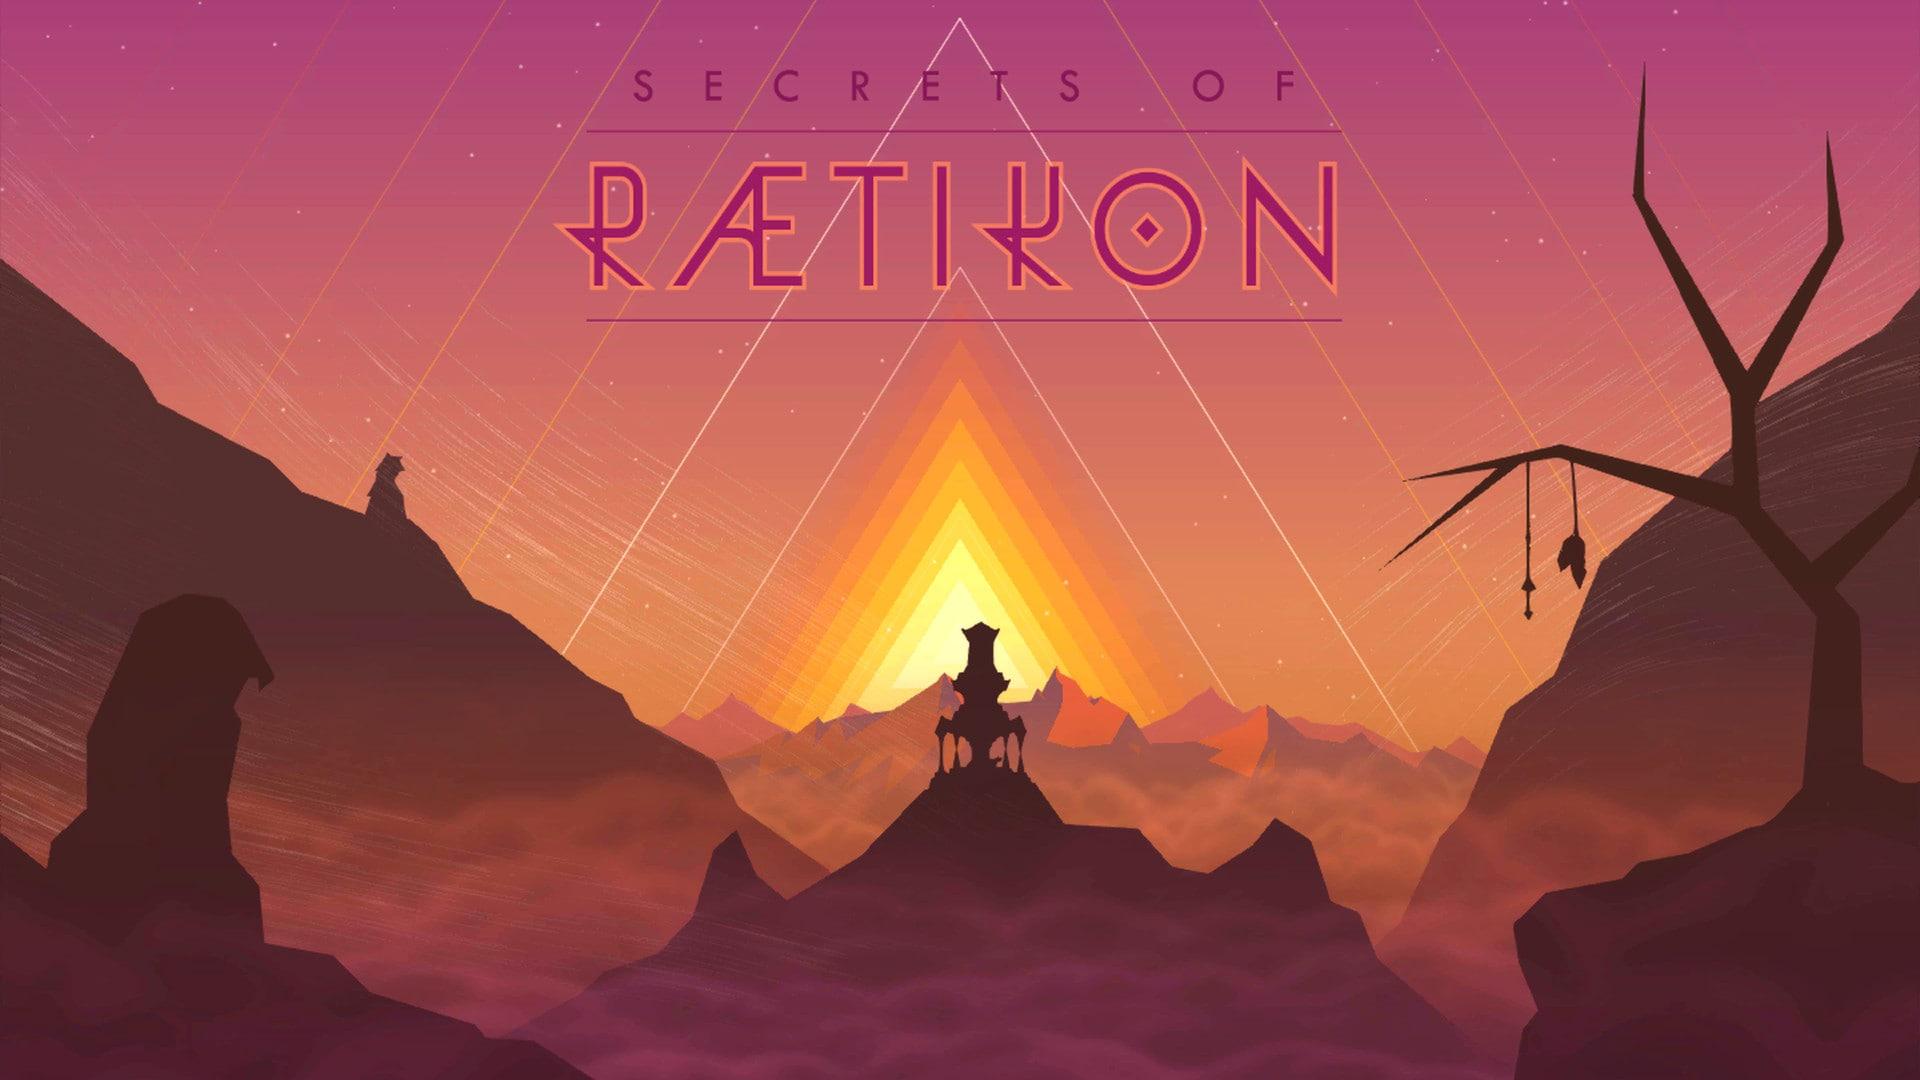 Secrets of Raetikon